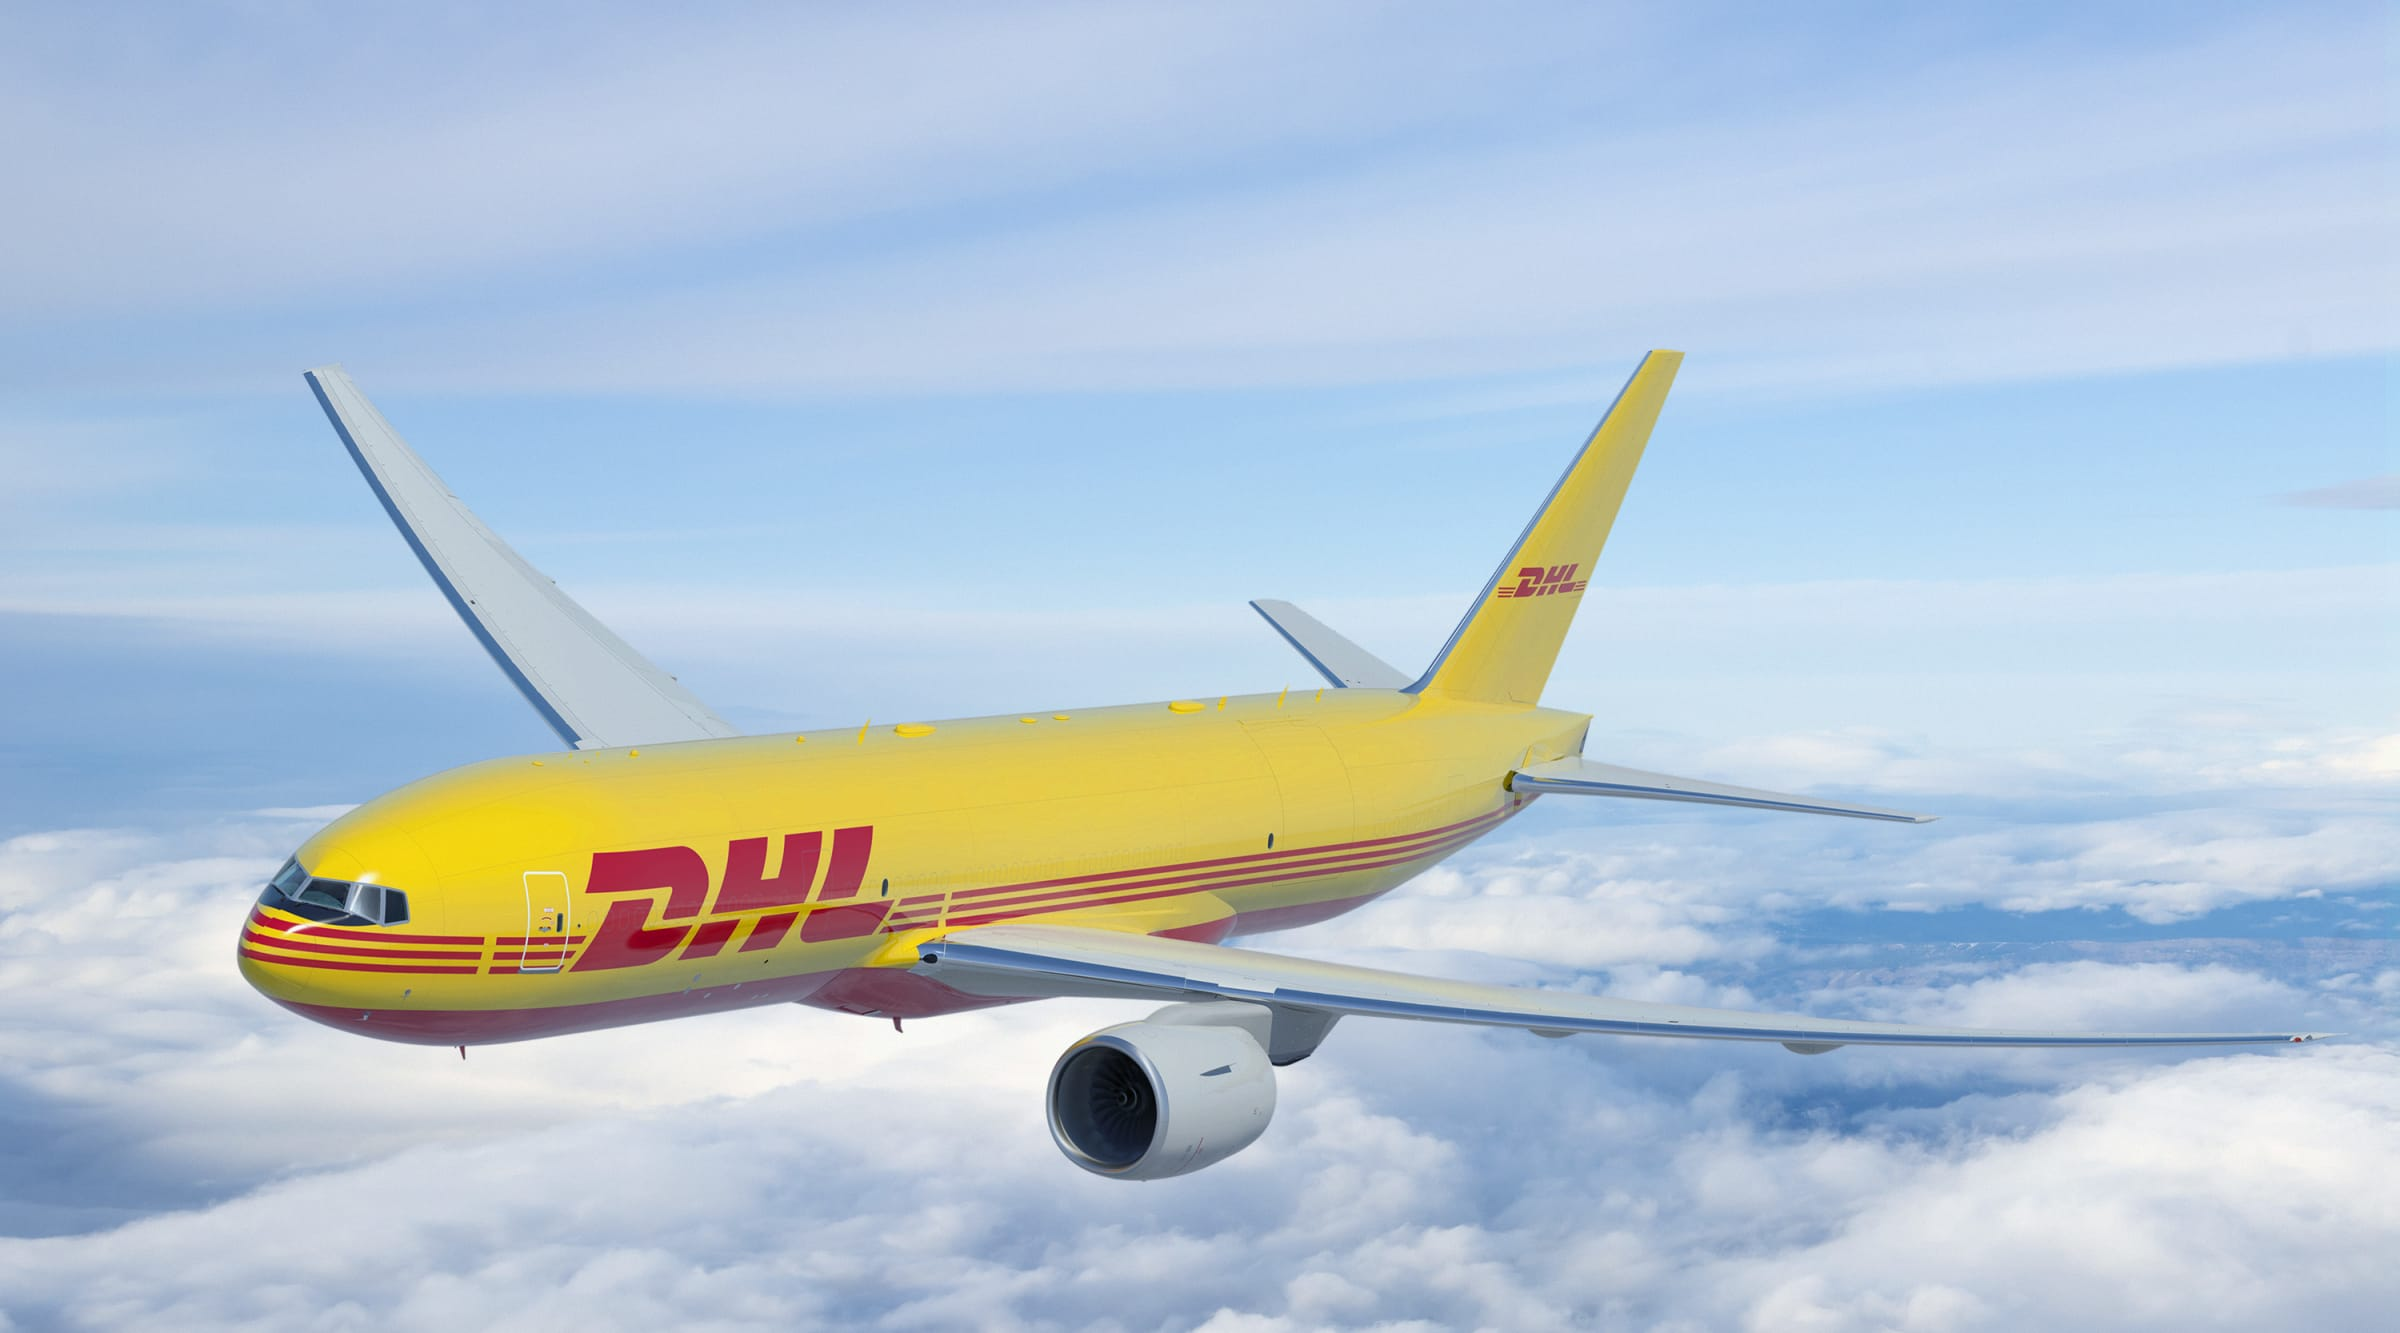 DHL Express oppgraderer sin flyflåte med seks nye Boeing 777 i år